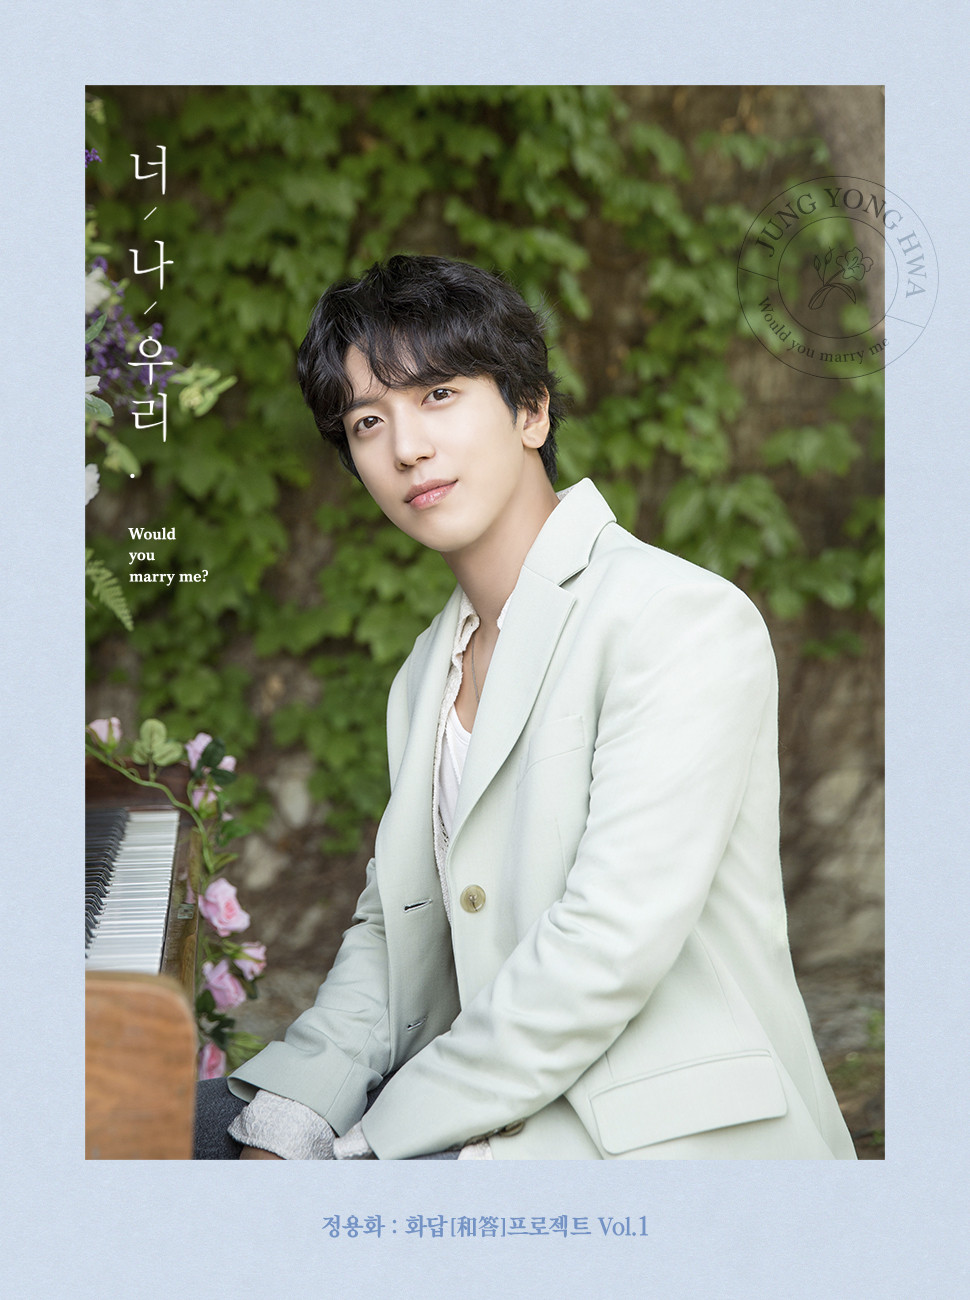 Manisnya Jung Yong Hwa Nyanyikan Would You Marry Me Bersama Yoon Doojoon Lee Joon Kwanghee Koreanindo